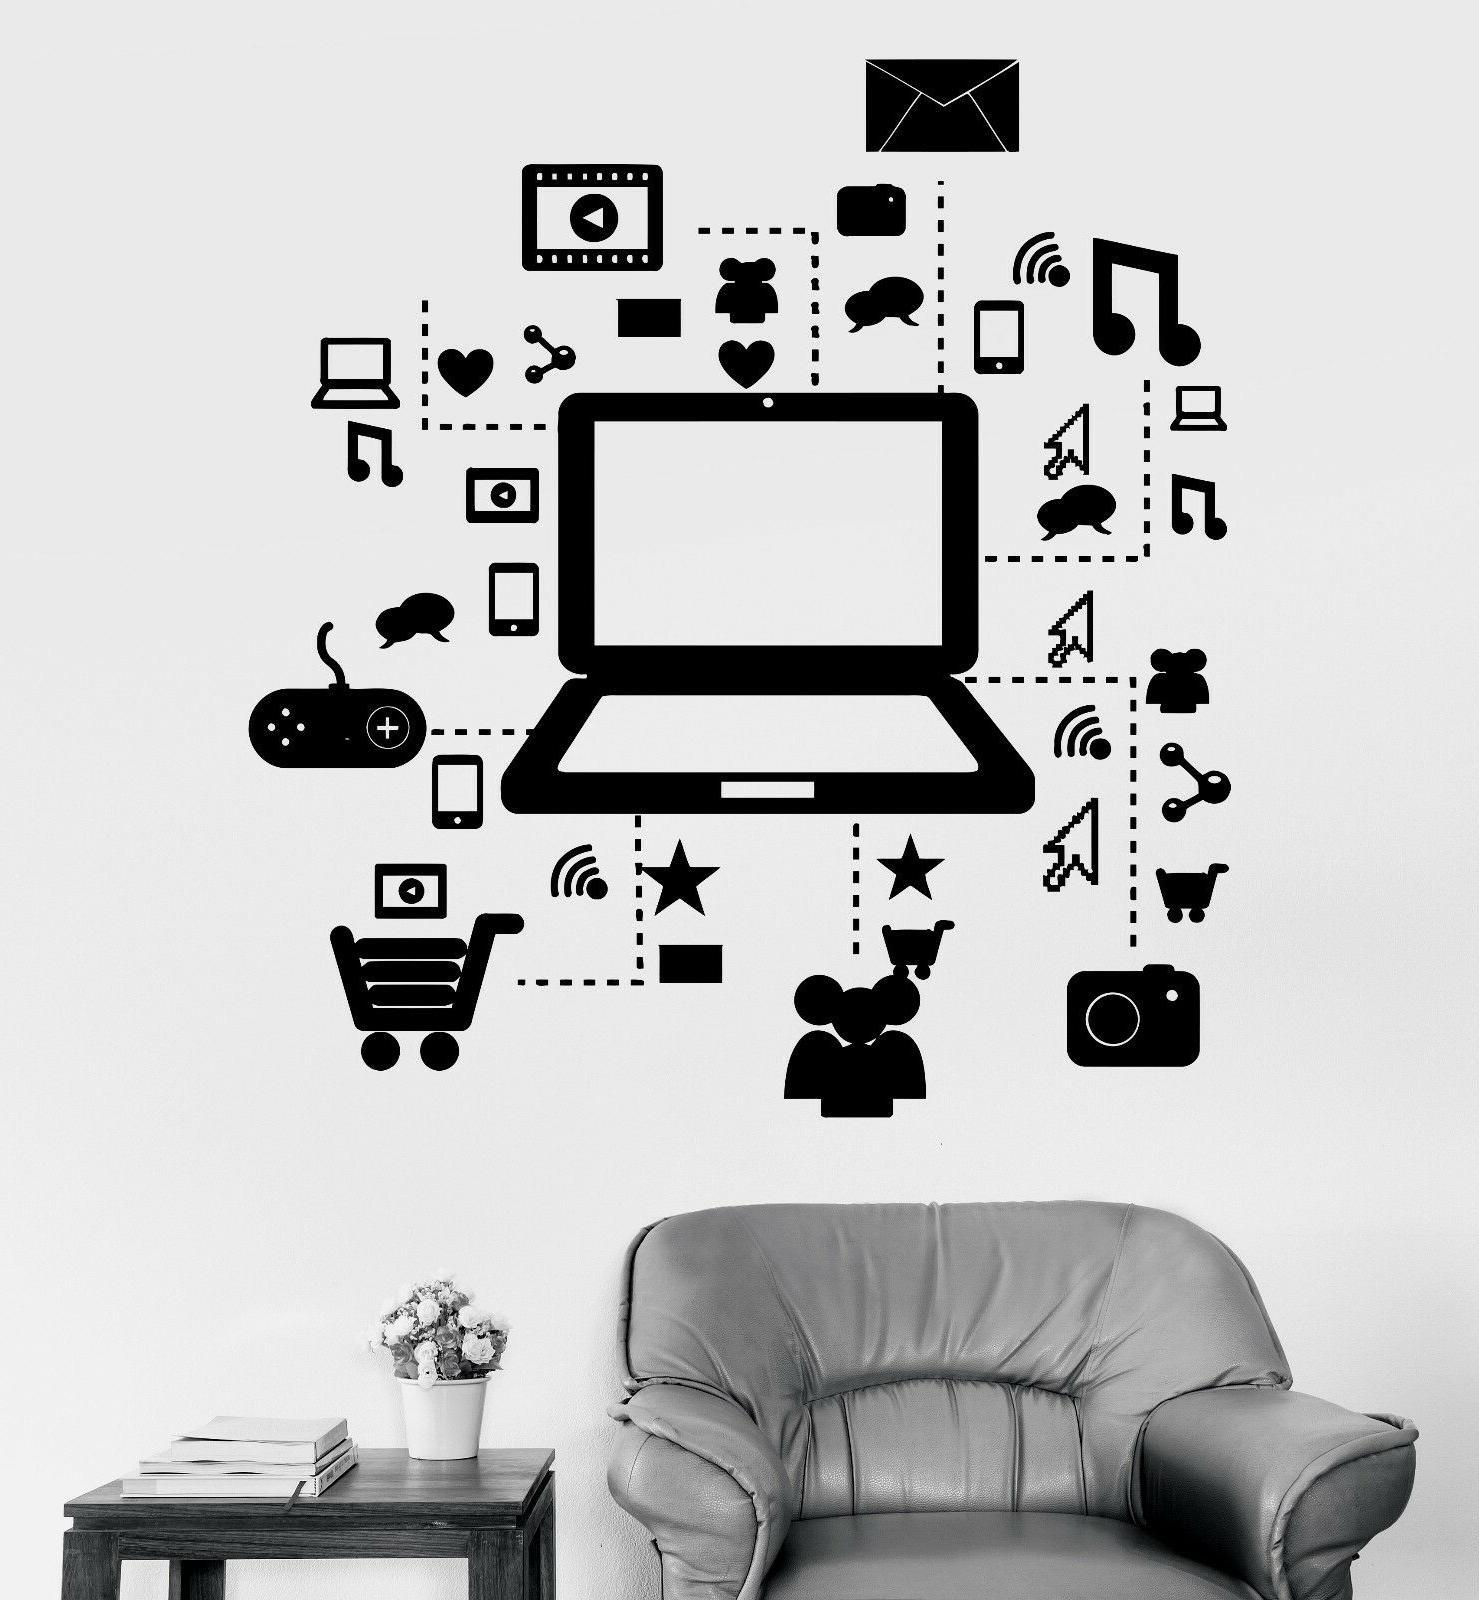 vinyl wall decal laptop computer online social